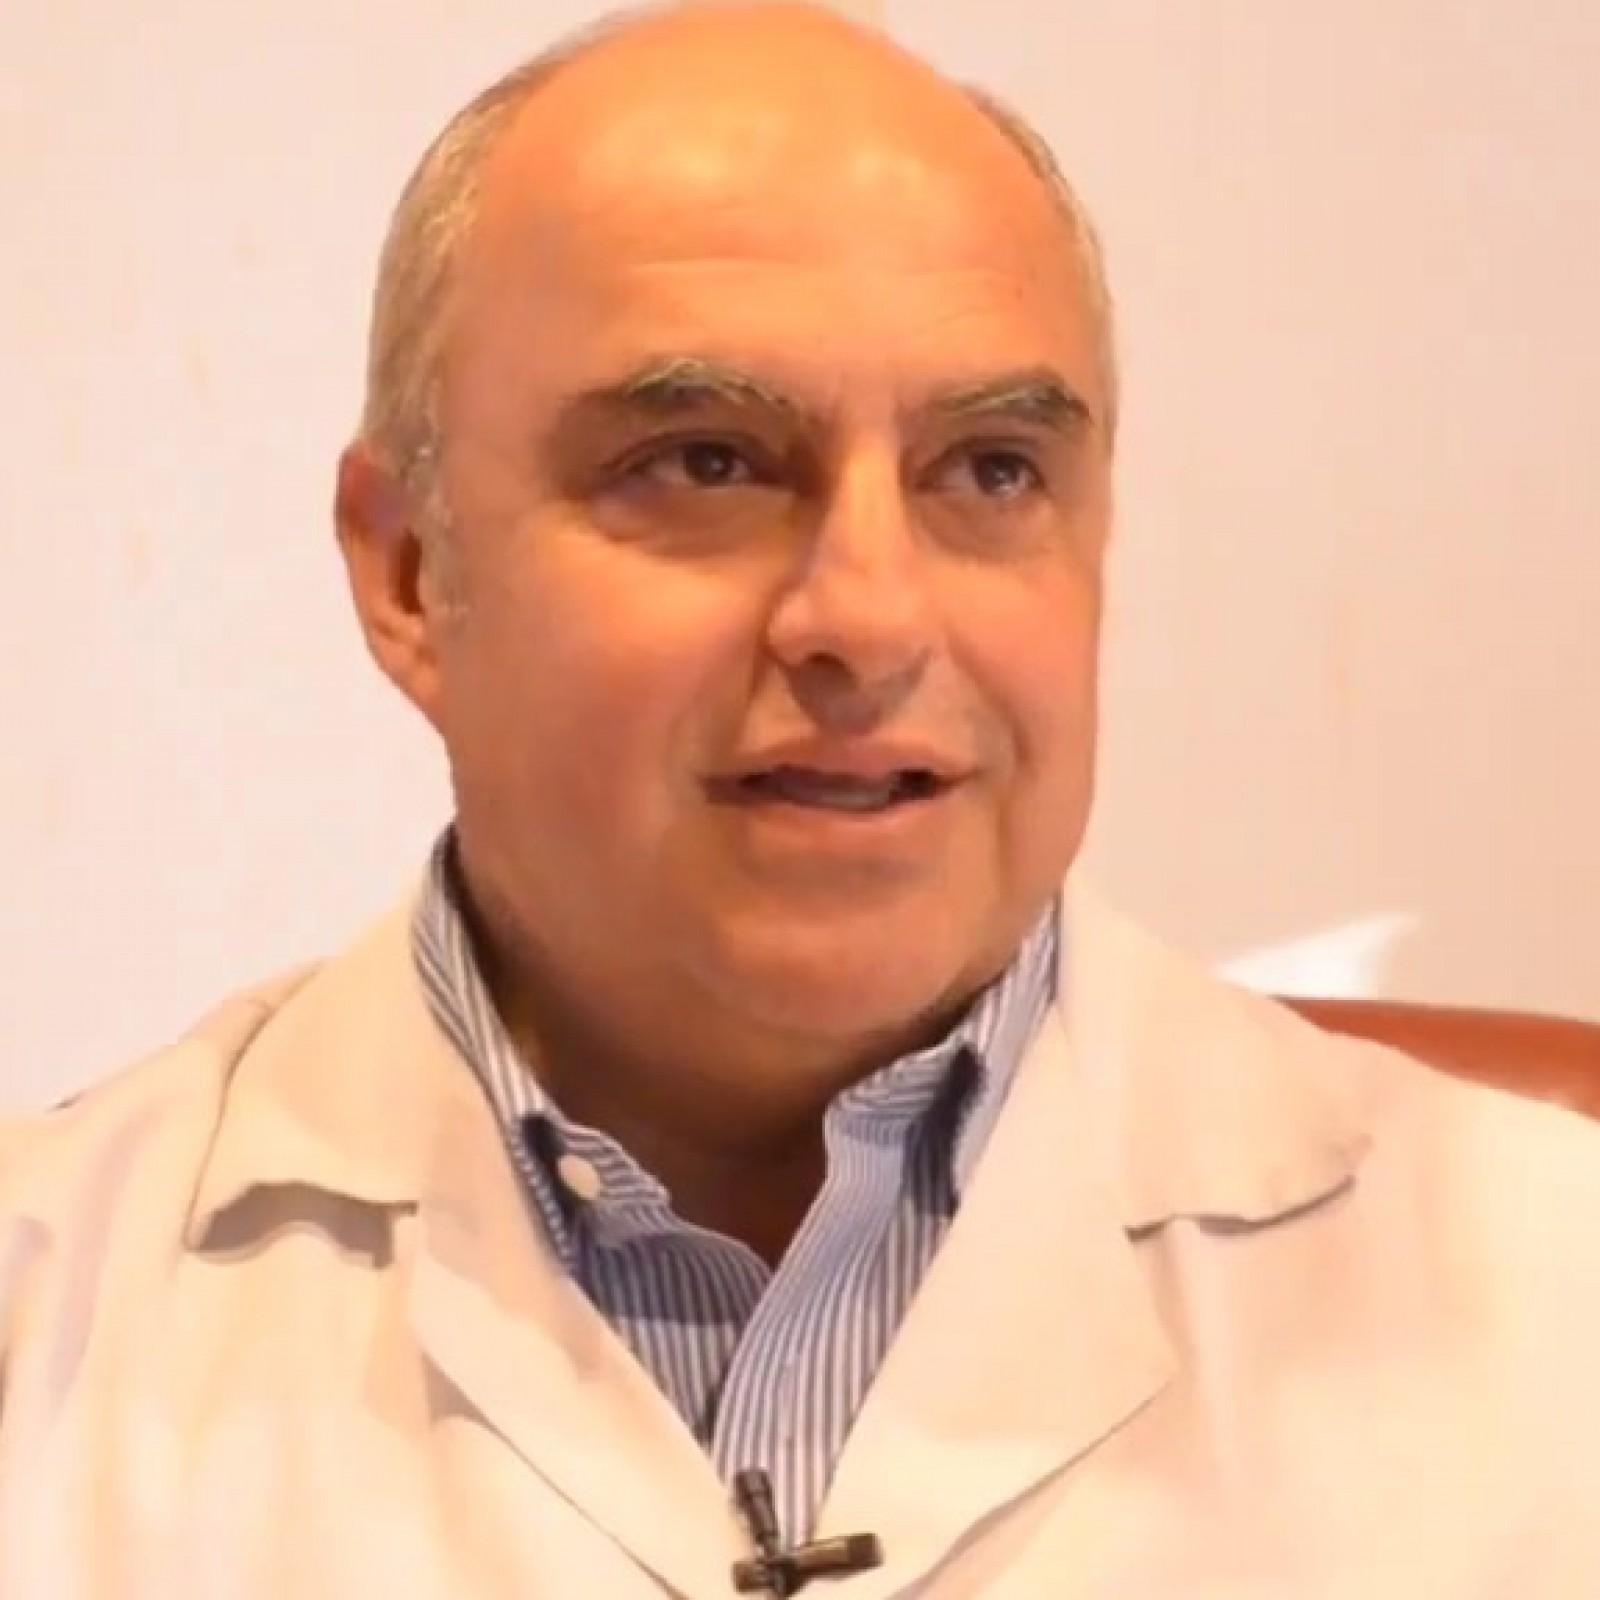 Dr. Yehia Salaheldin Mostafa